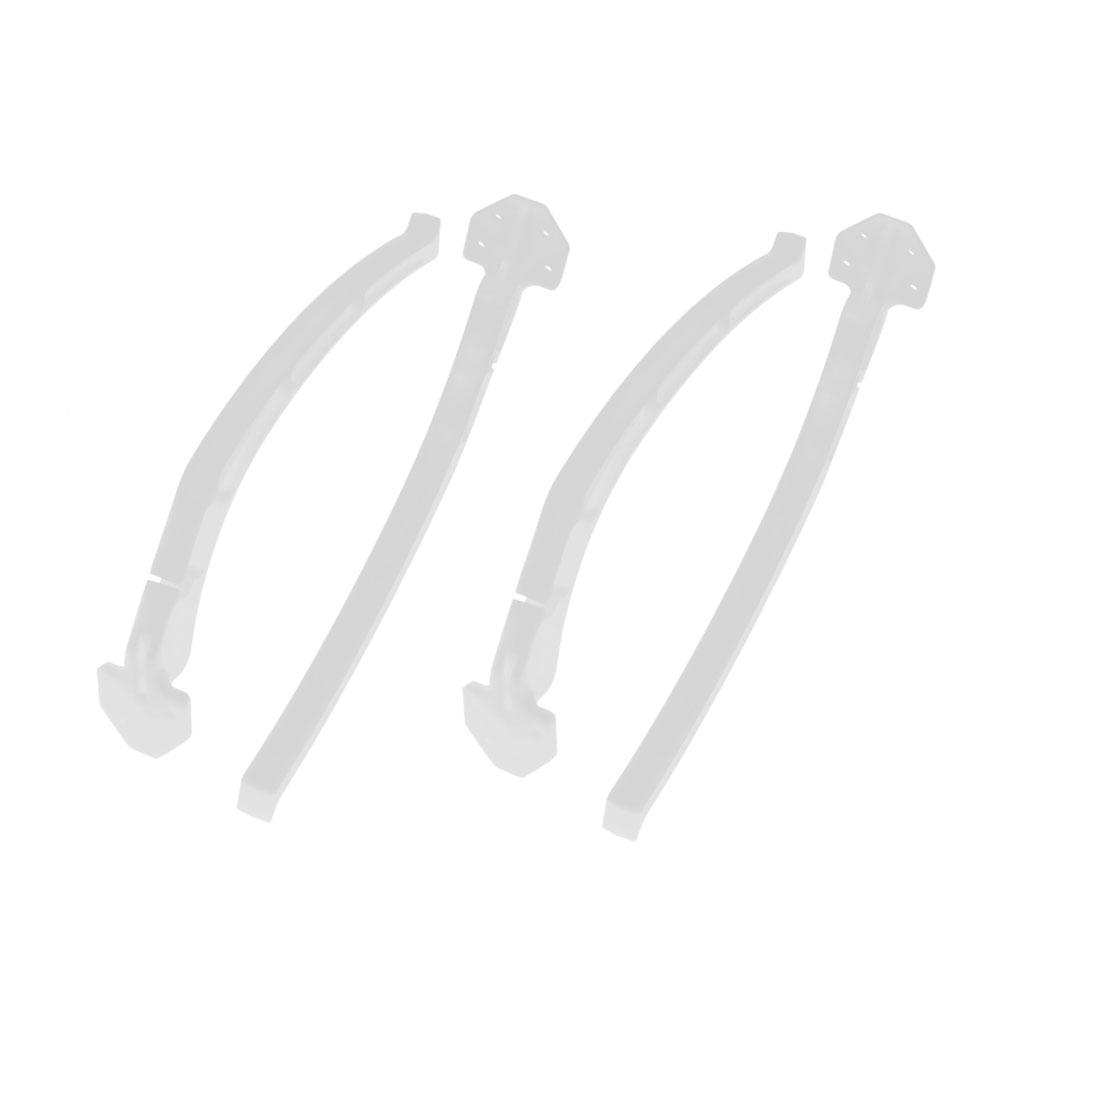 4 Pcs White Universal Landing Gear Skids for DJI F450 F550 Aerial Photo